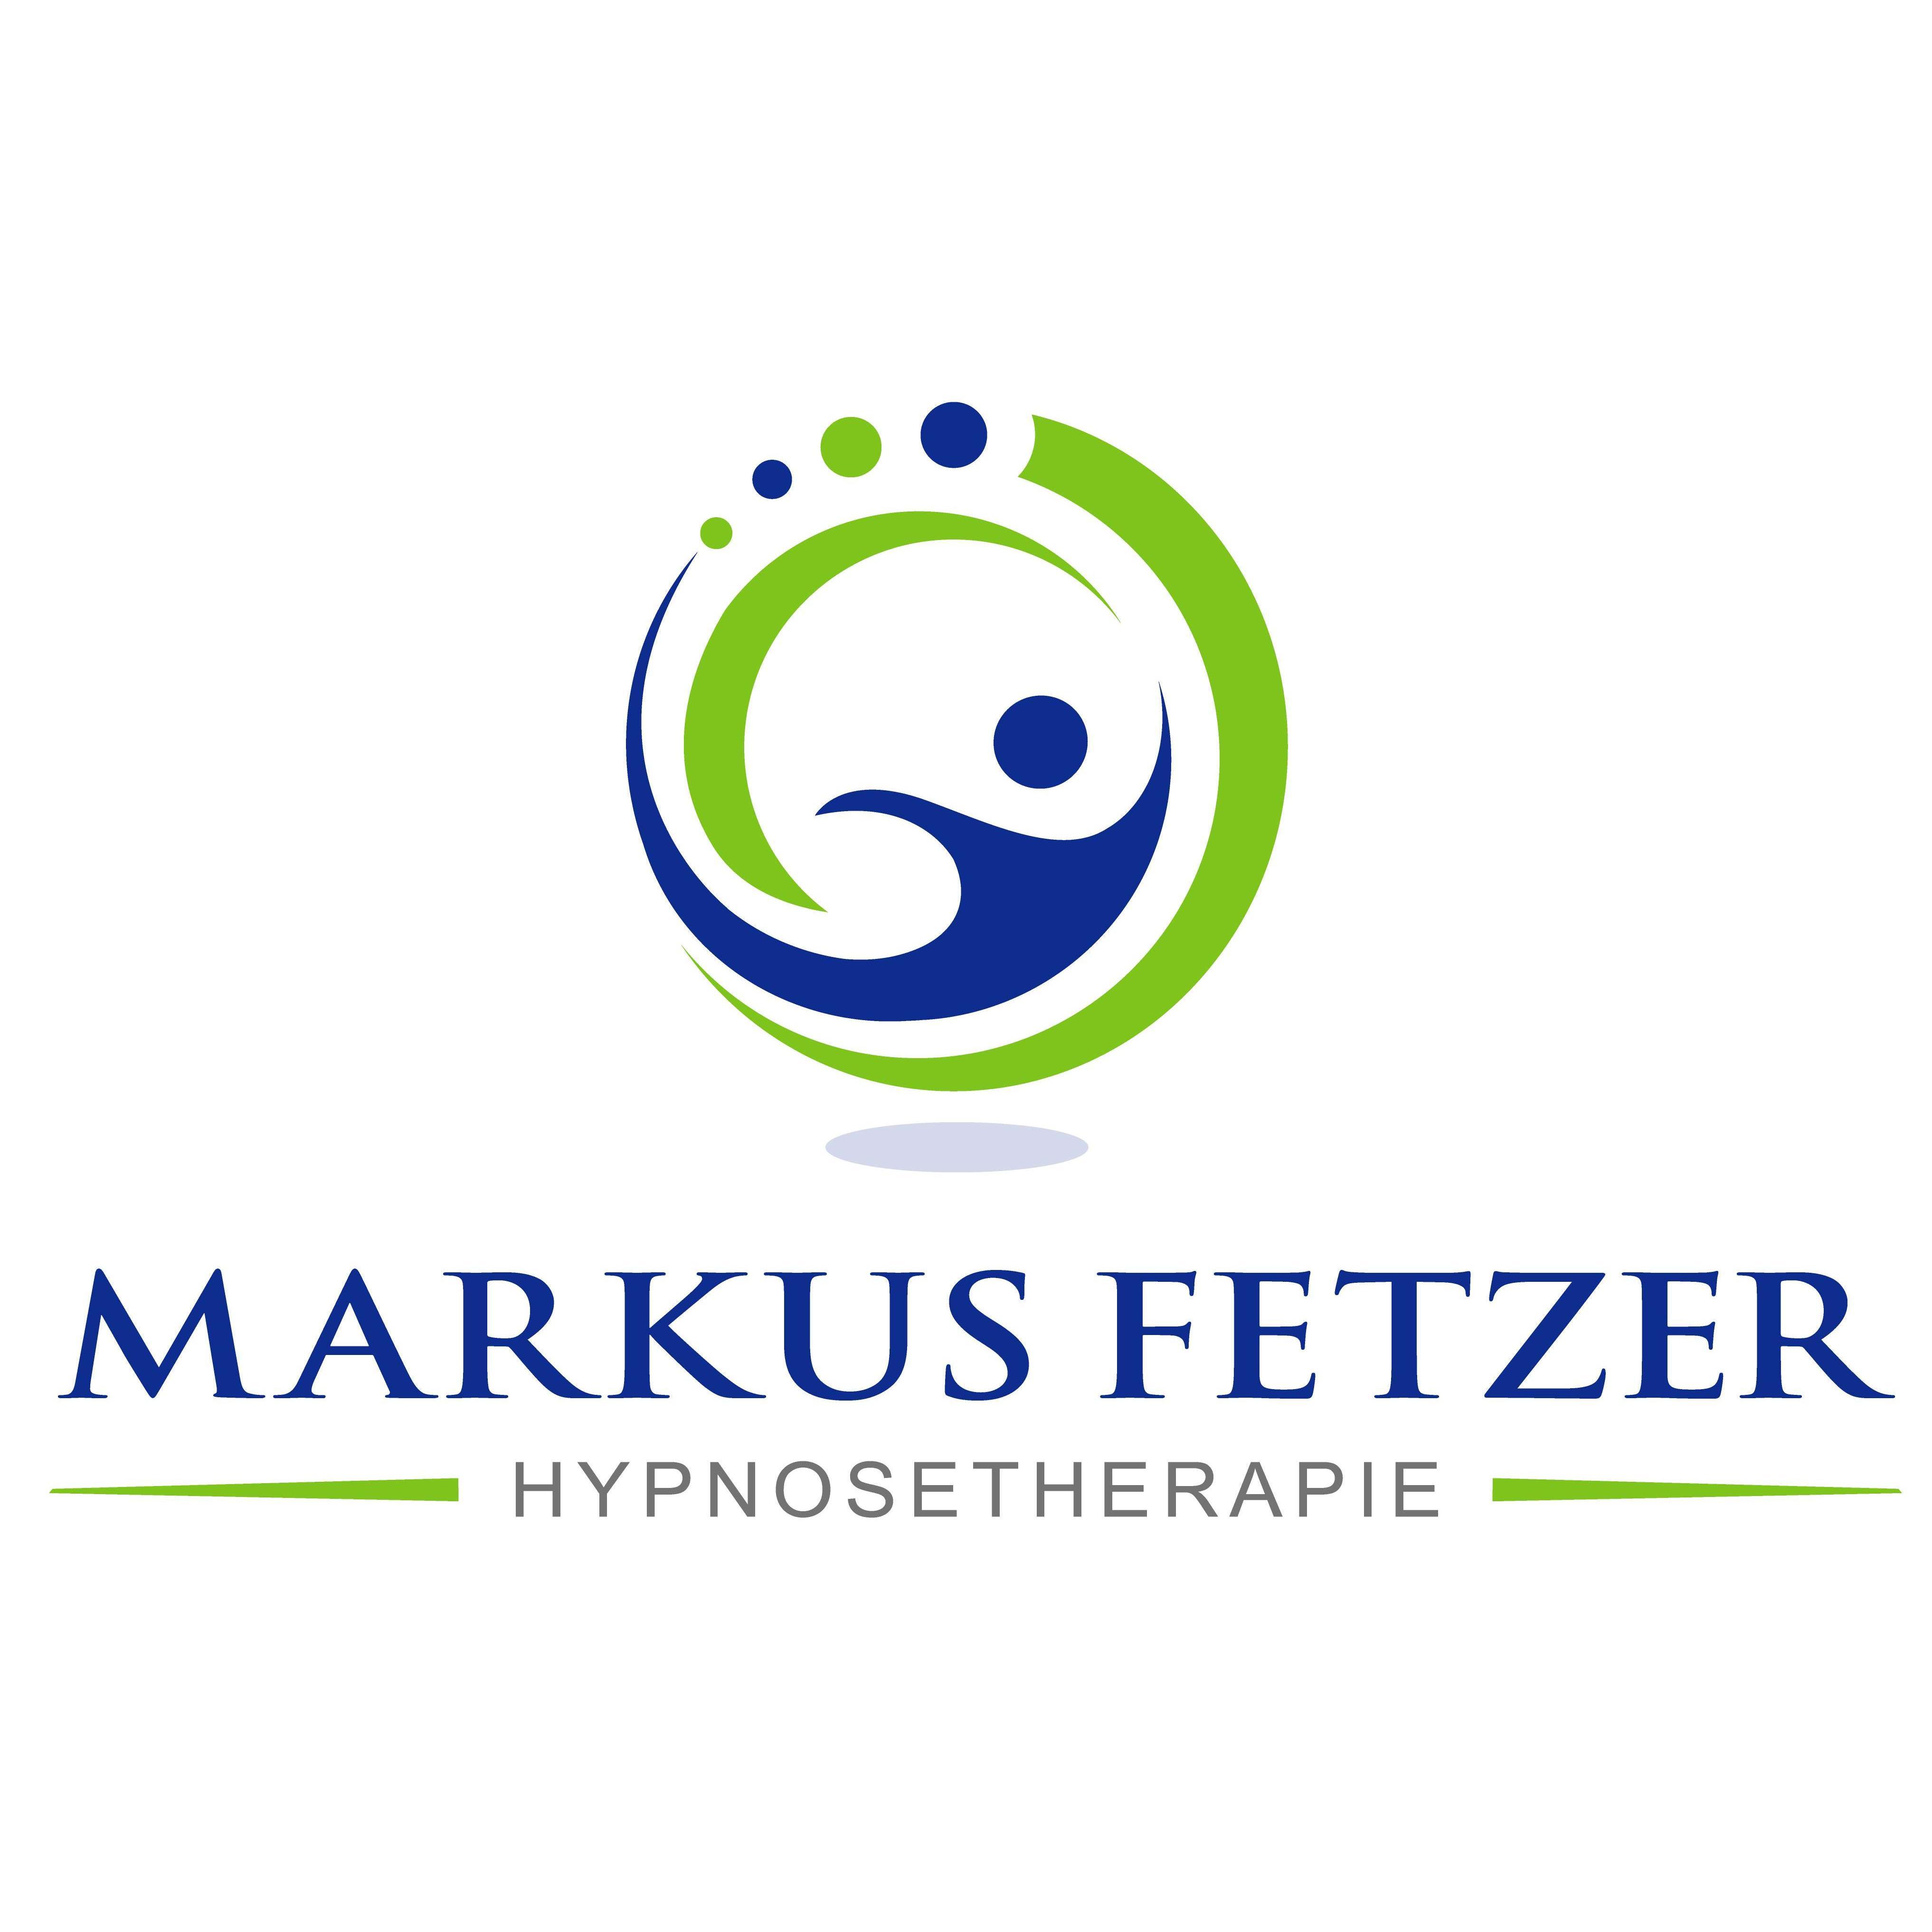 Markus Fetzer - Hypnosetherapie